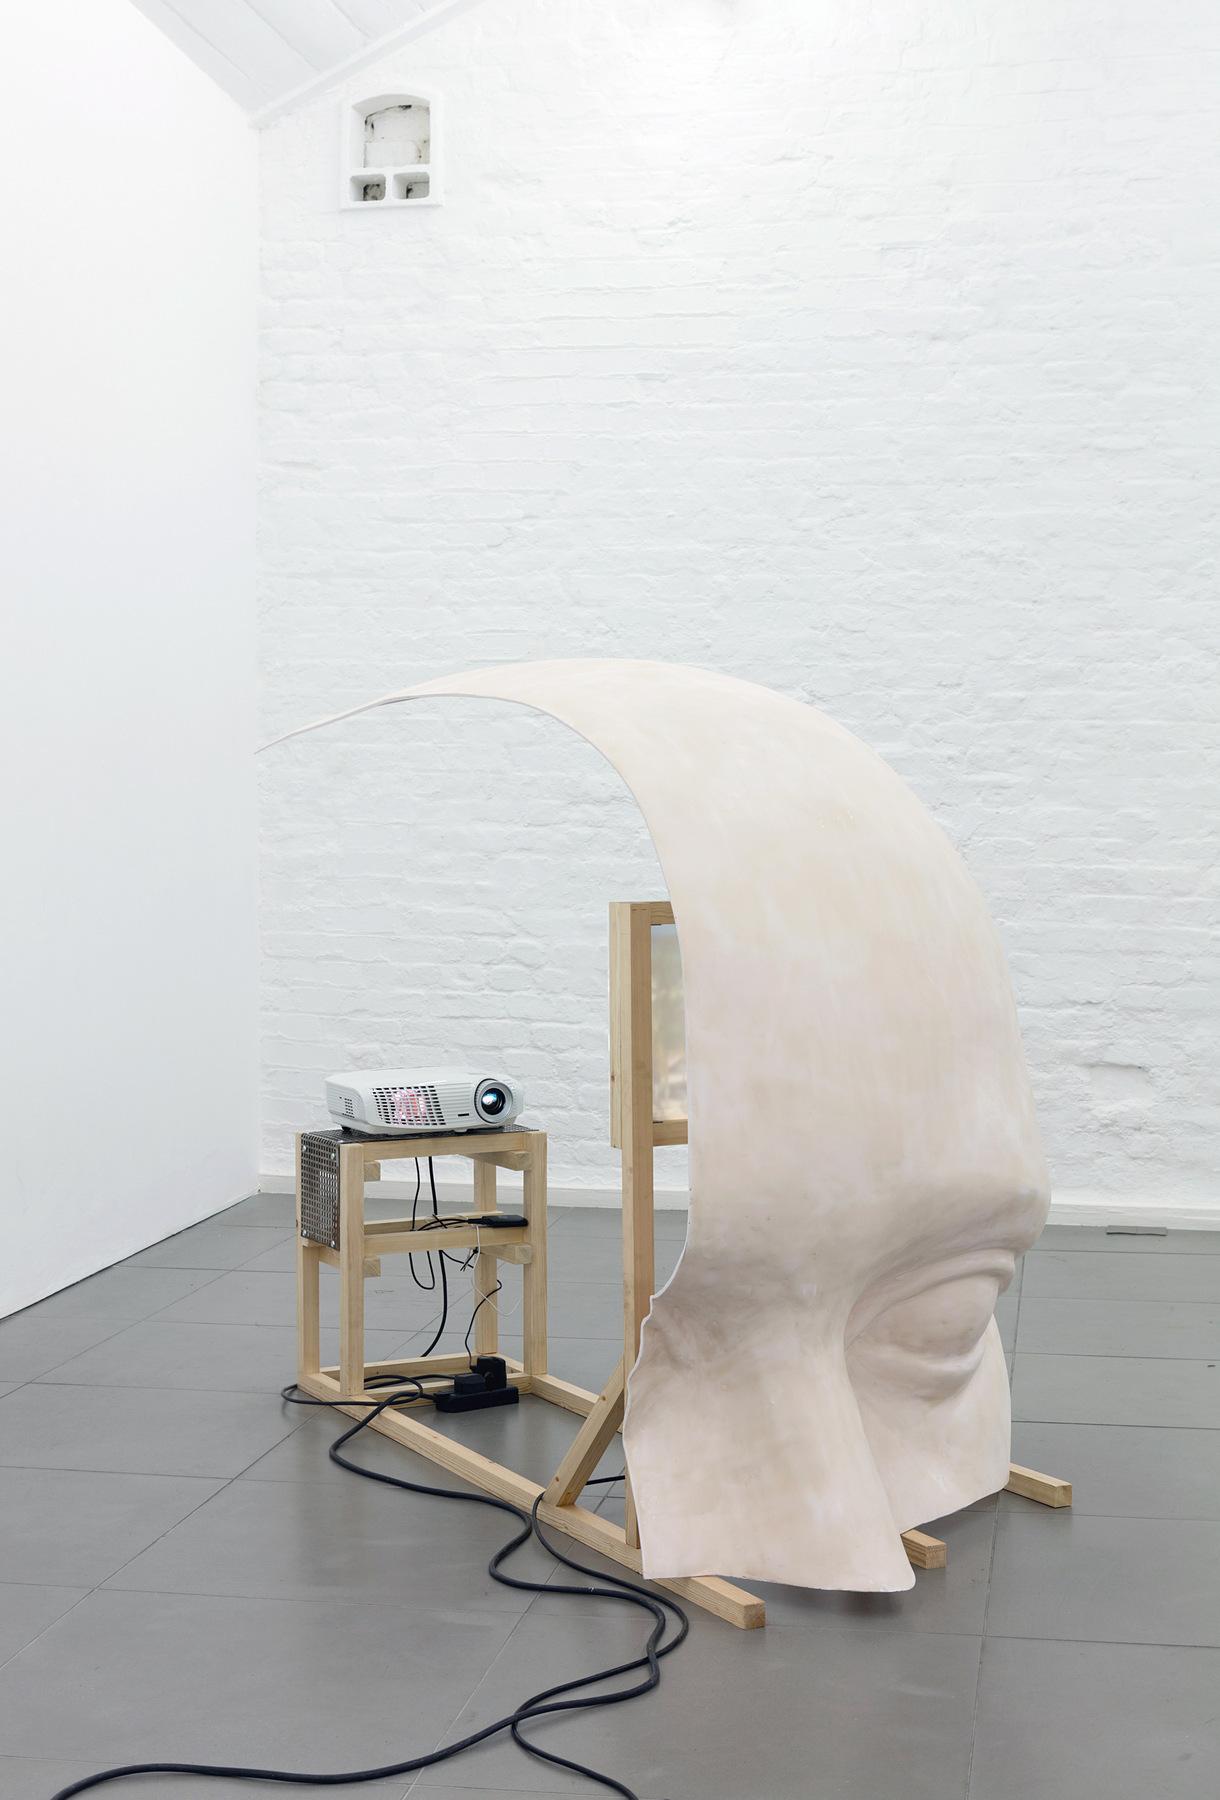 02. Anne de Vries, SUBMISSION 2015, wood, metal, fibreglass resin, audio, video